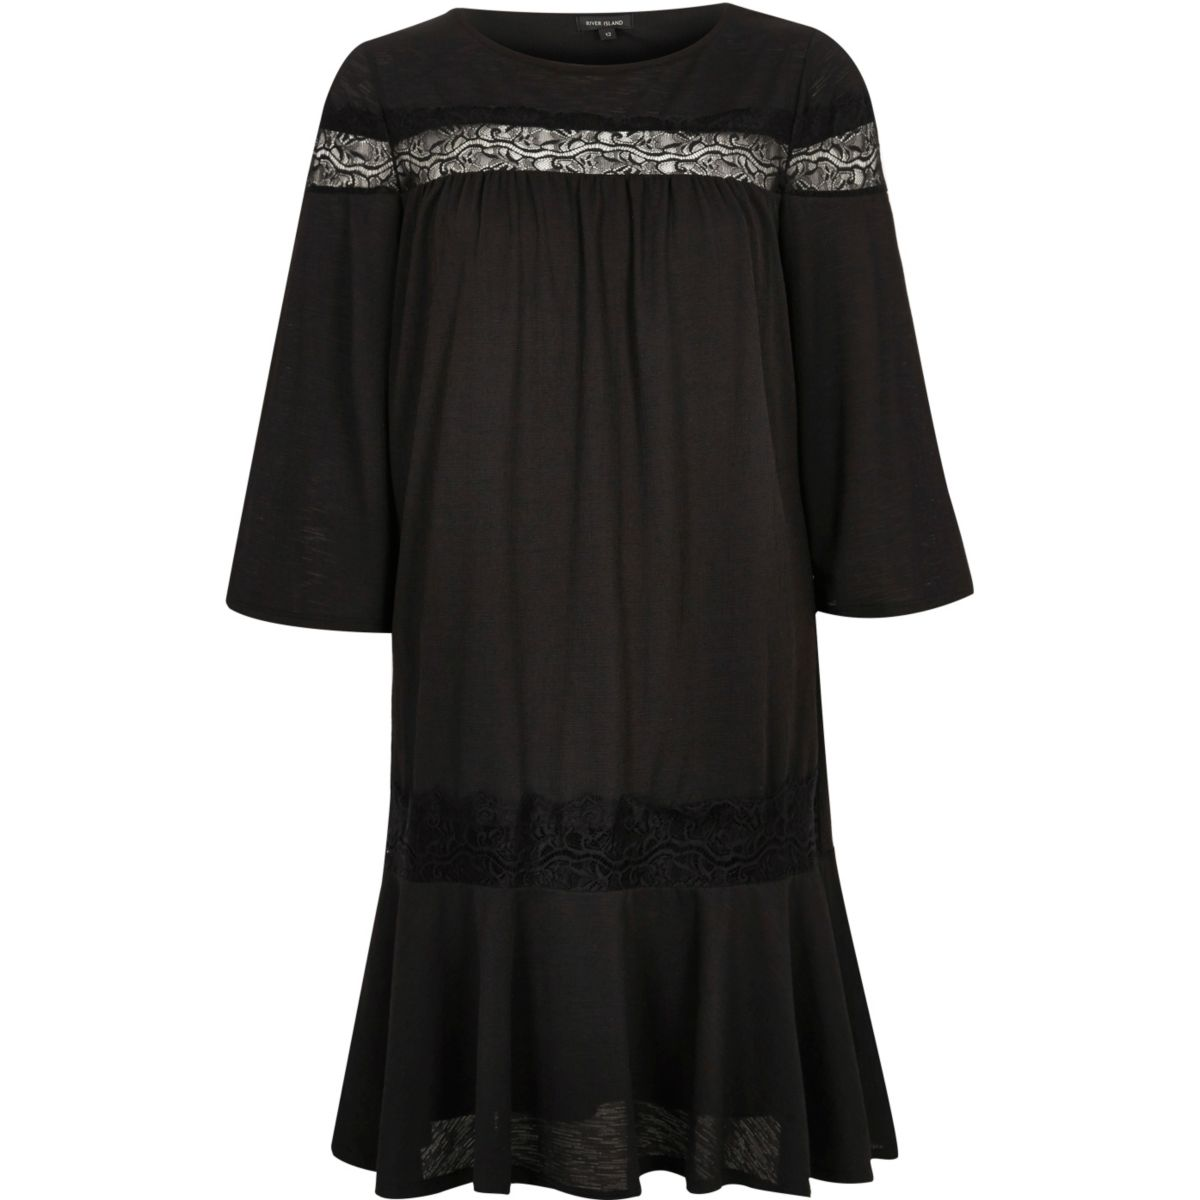 Black short sleeve lace smock dress